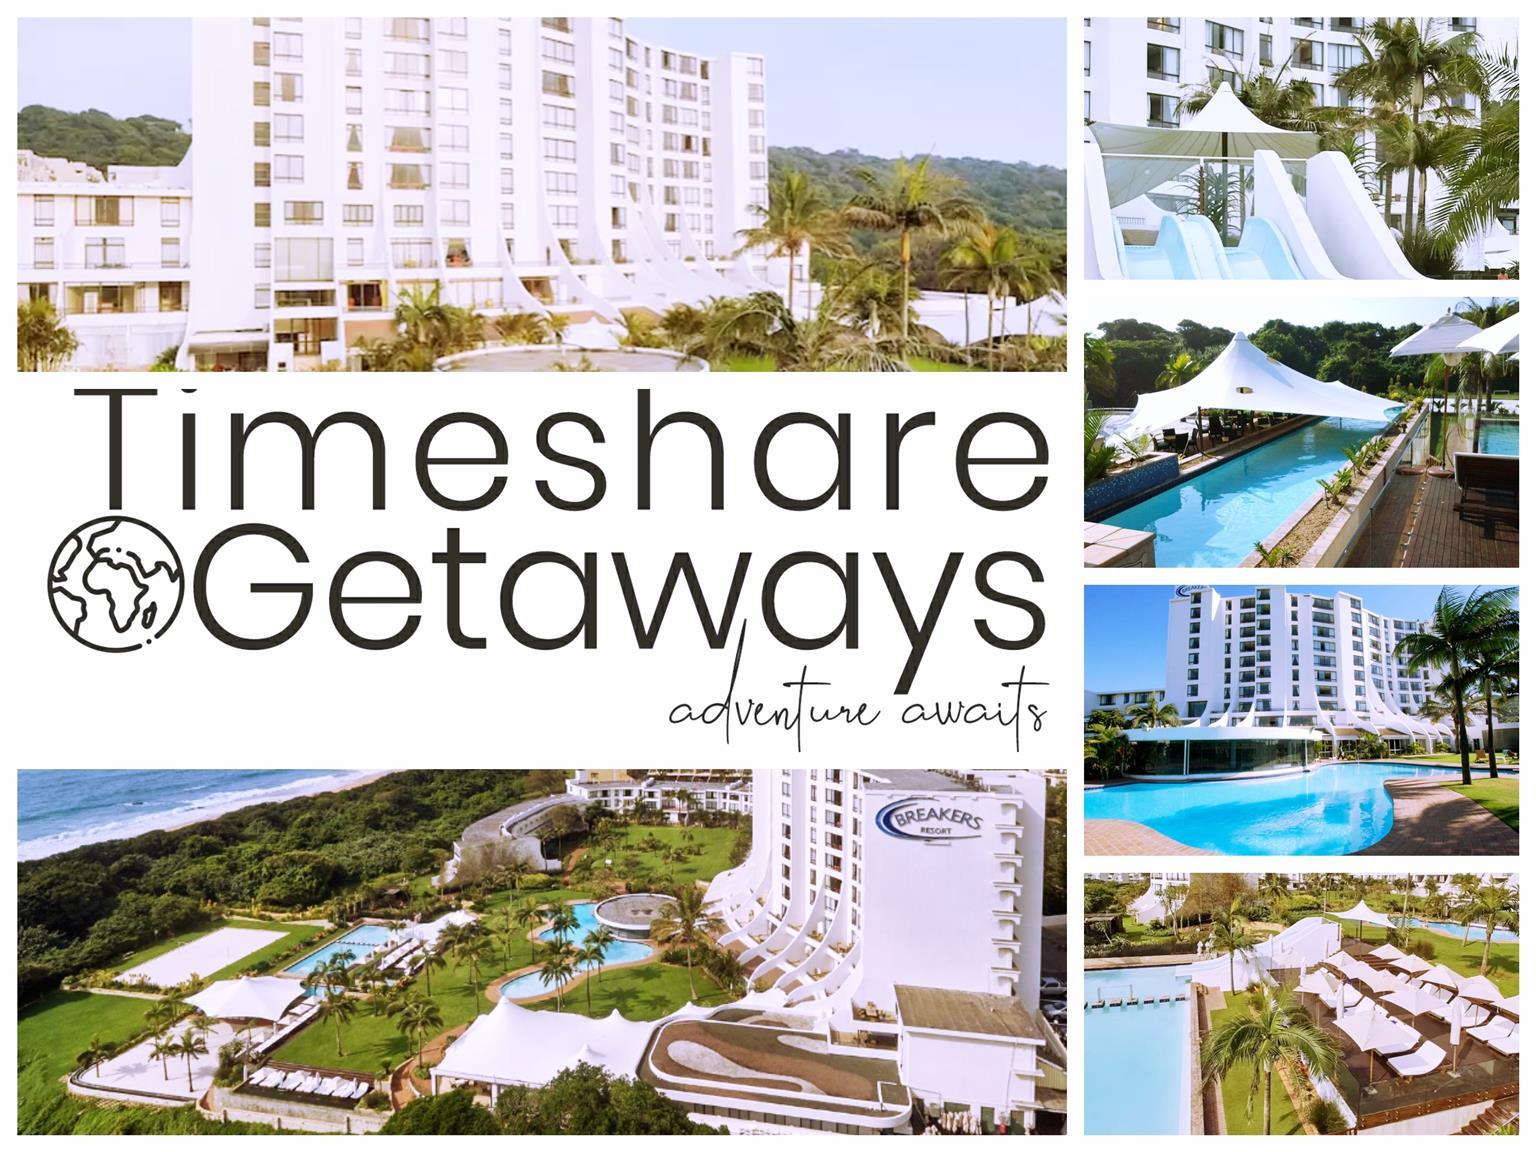 Breakers Resort March Getaways **REDUCED TO GO**